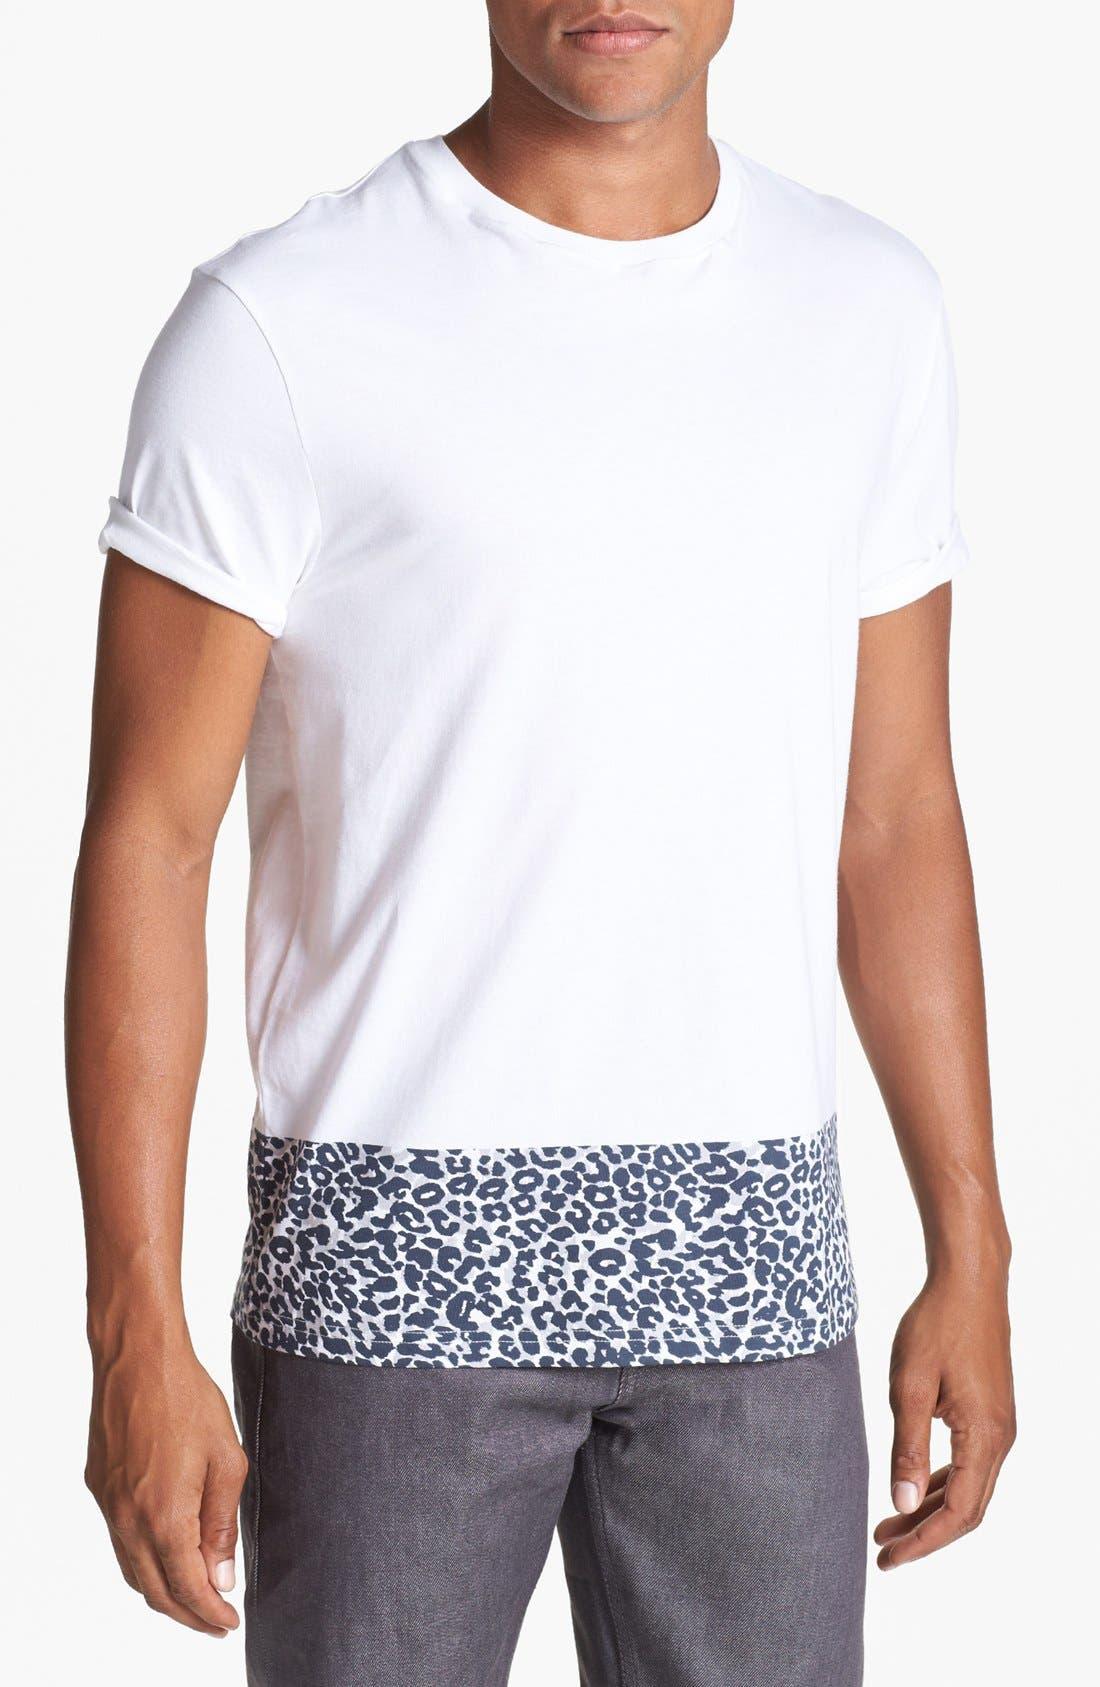 Alternate Image 1 Selected - Topman Leopard Print Trim T-Shirt